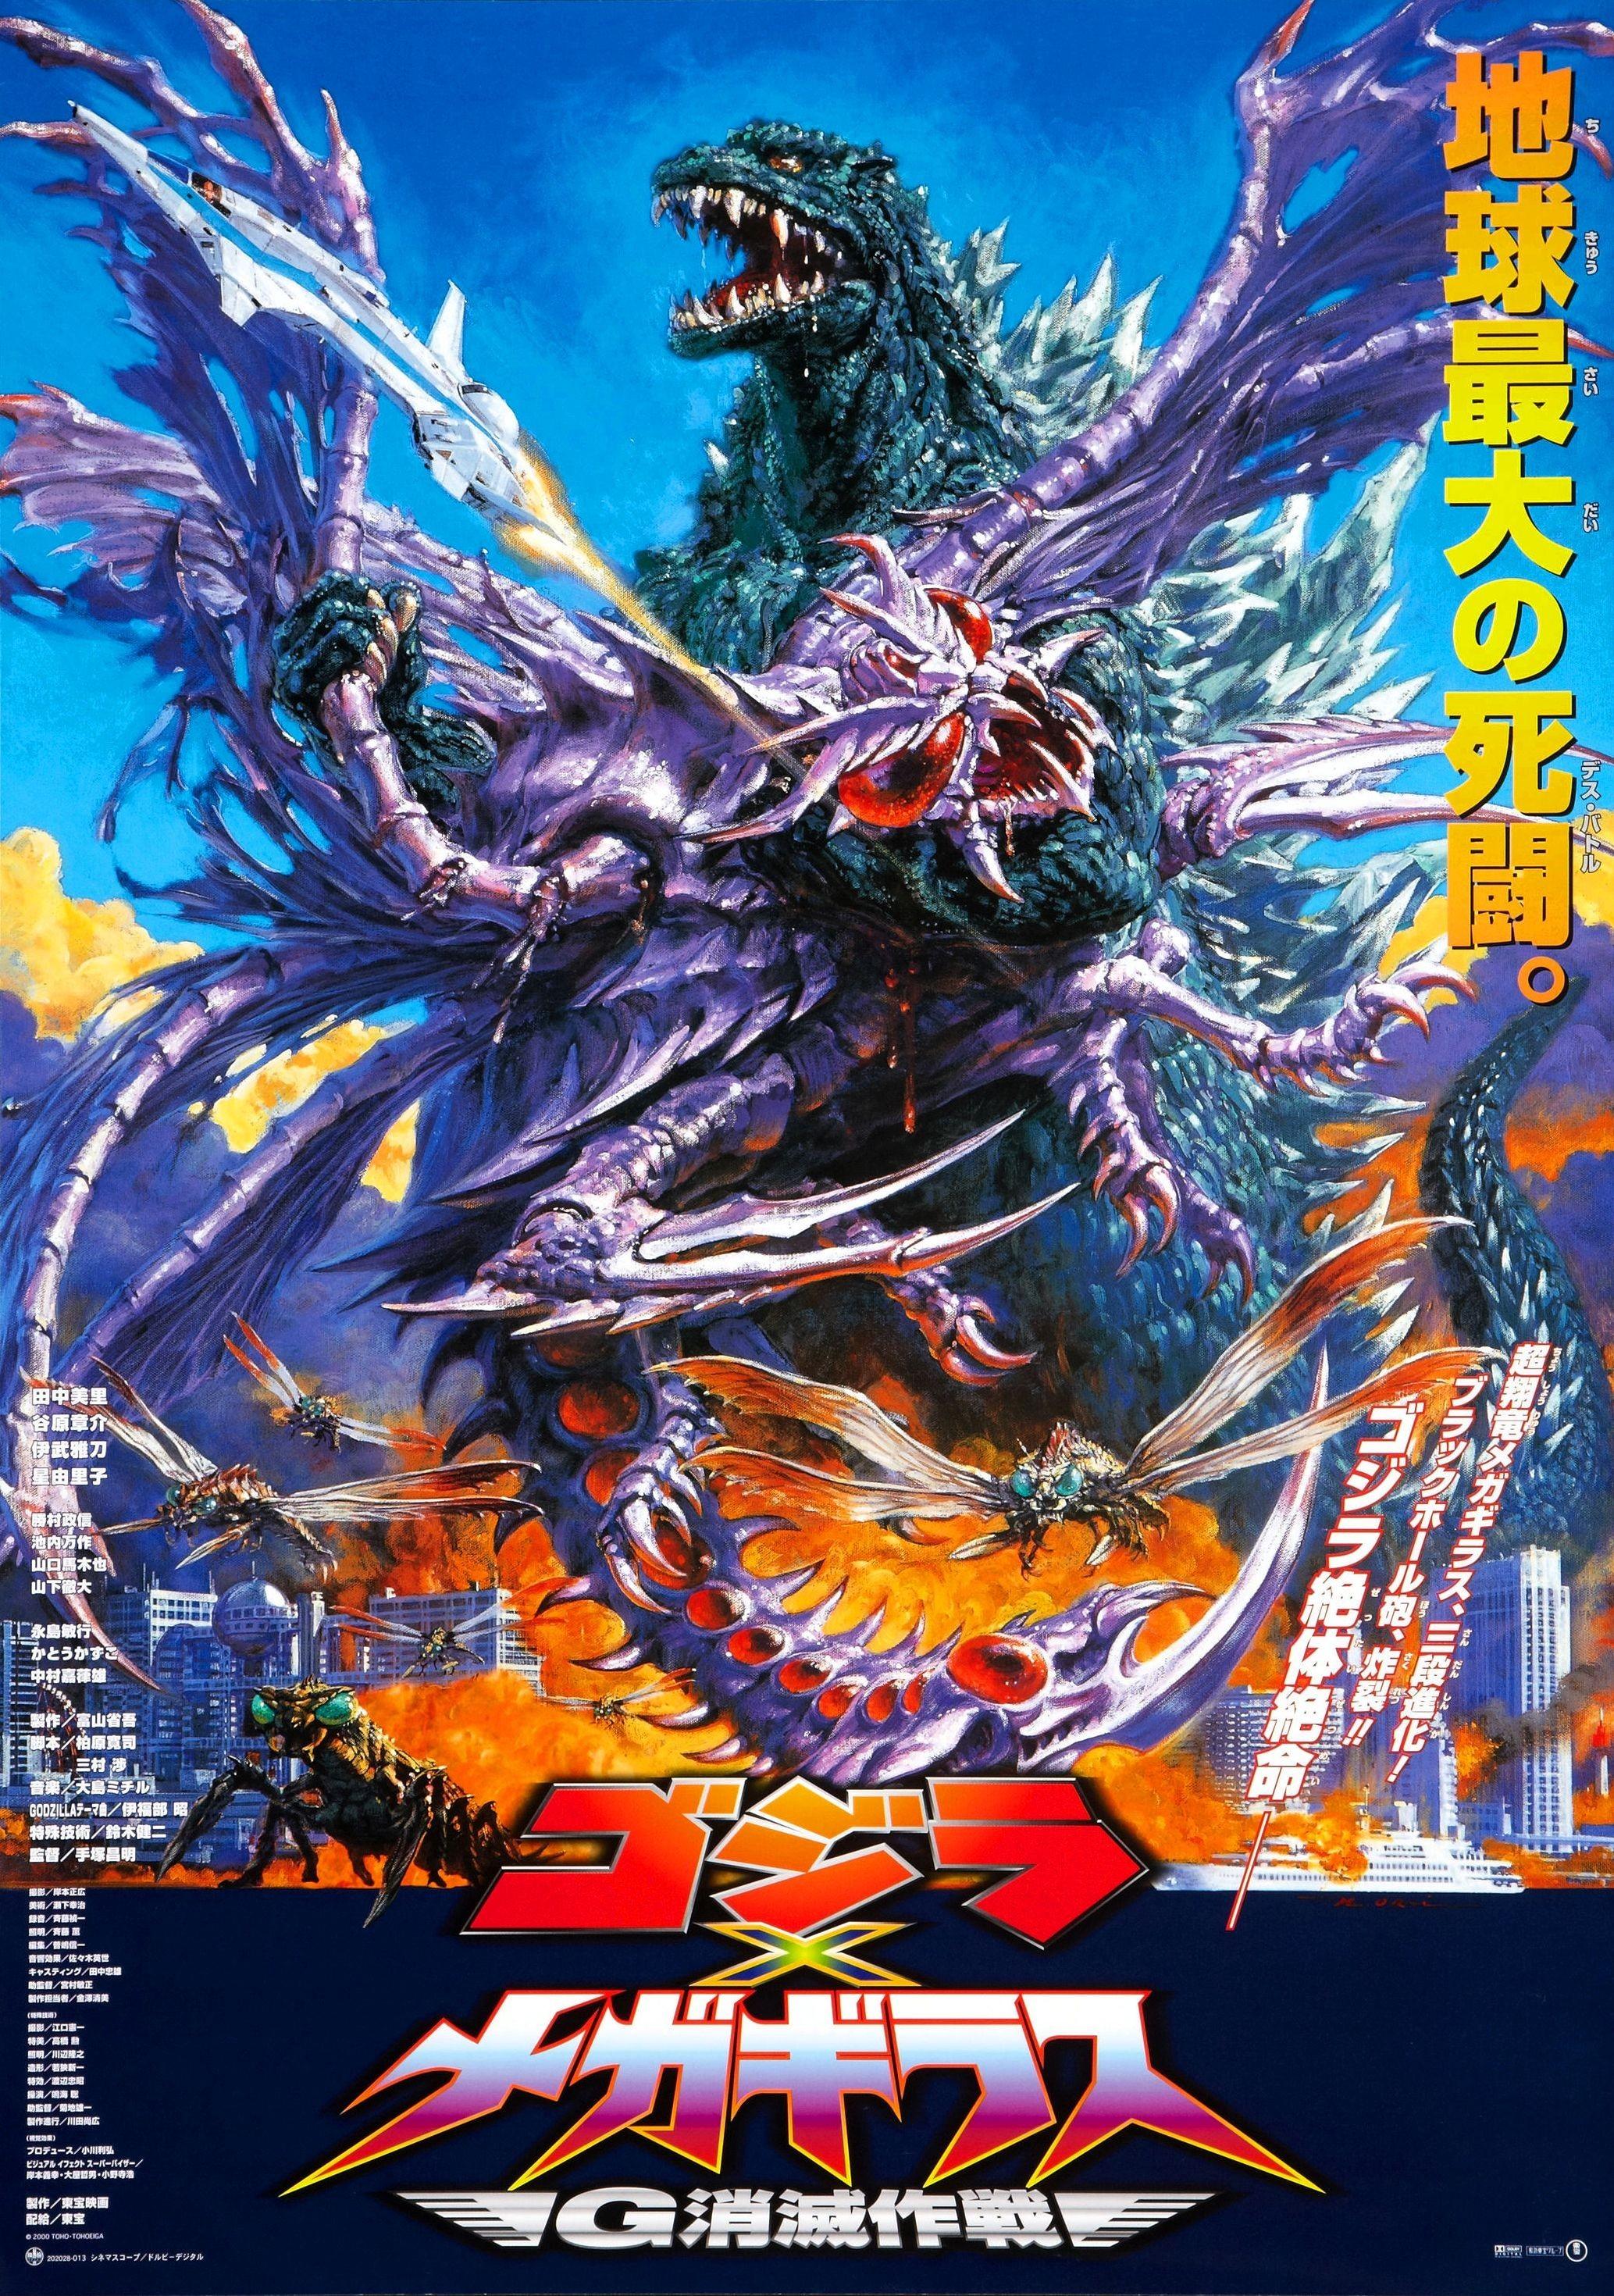 Res: 2067x2940, Mothra Vs Godzilla - Monster B Movie Posters Wallpaper Image   In ..